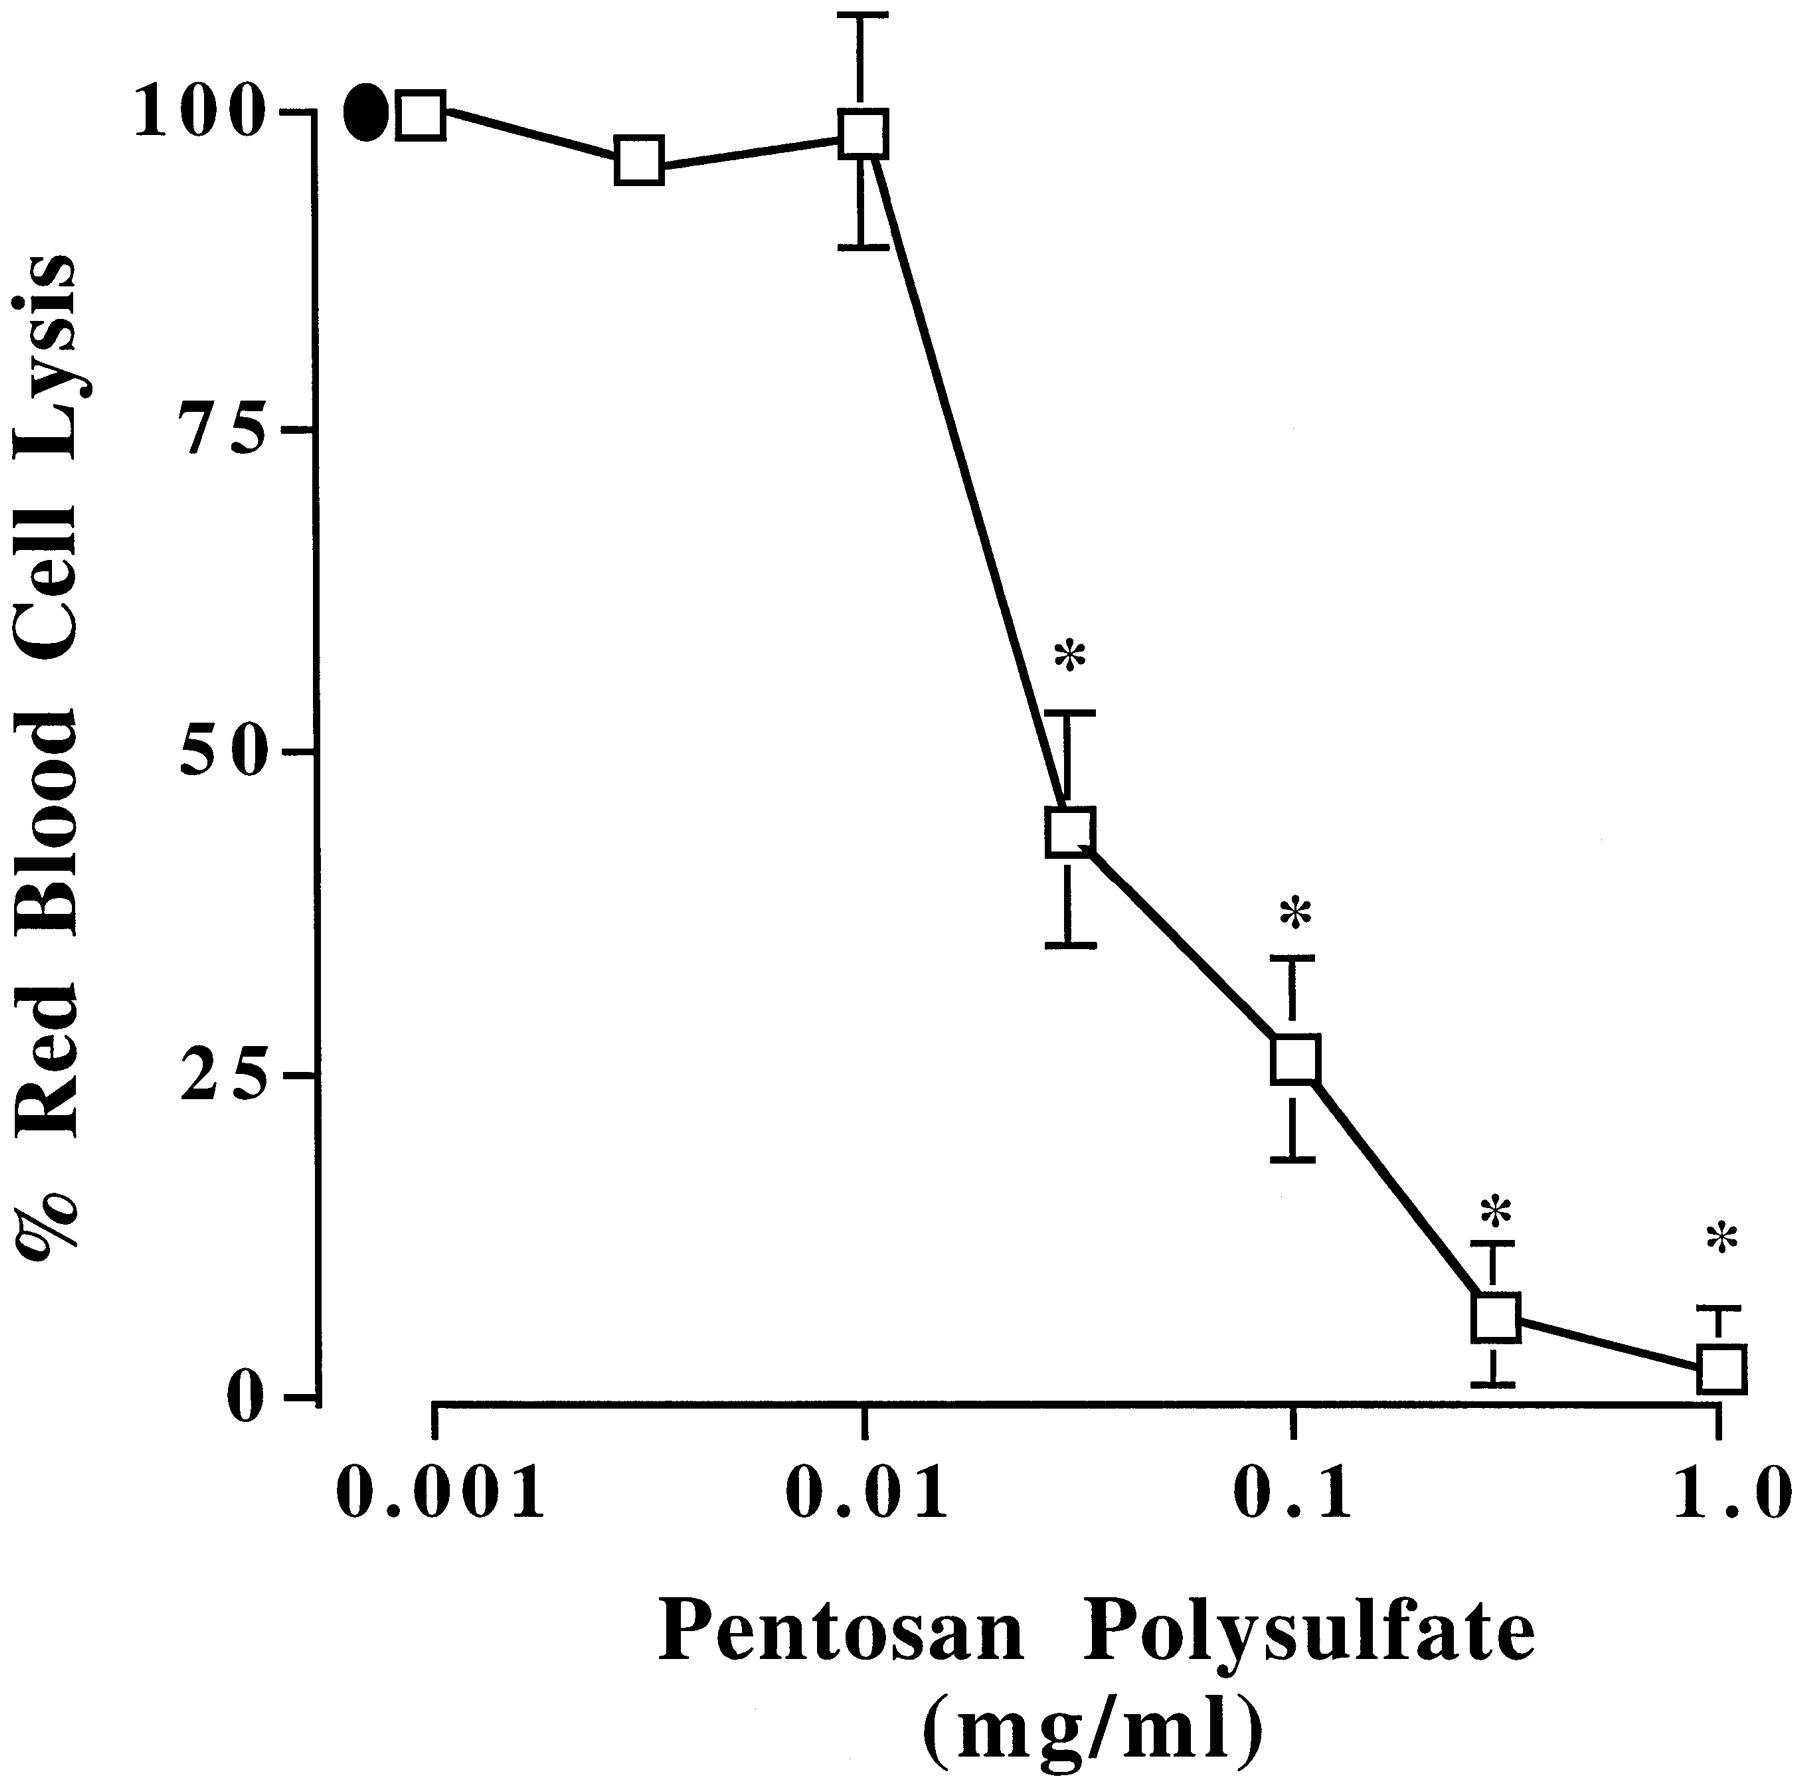 The Semisynthetic Polysaccharide Pentosan Polysulfate Prevents